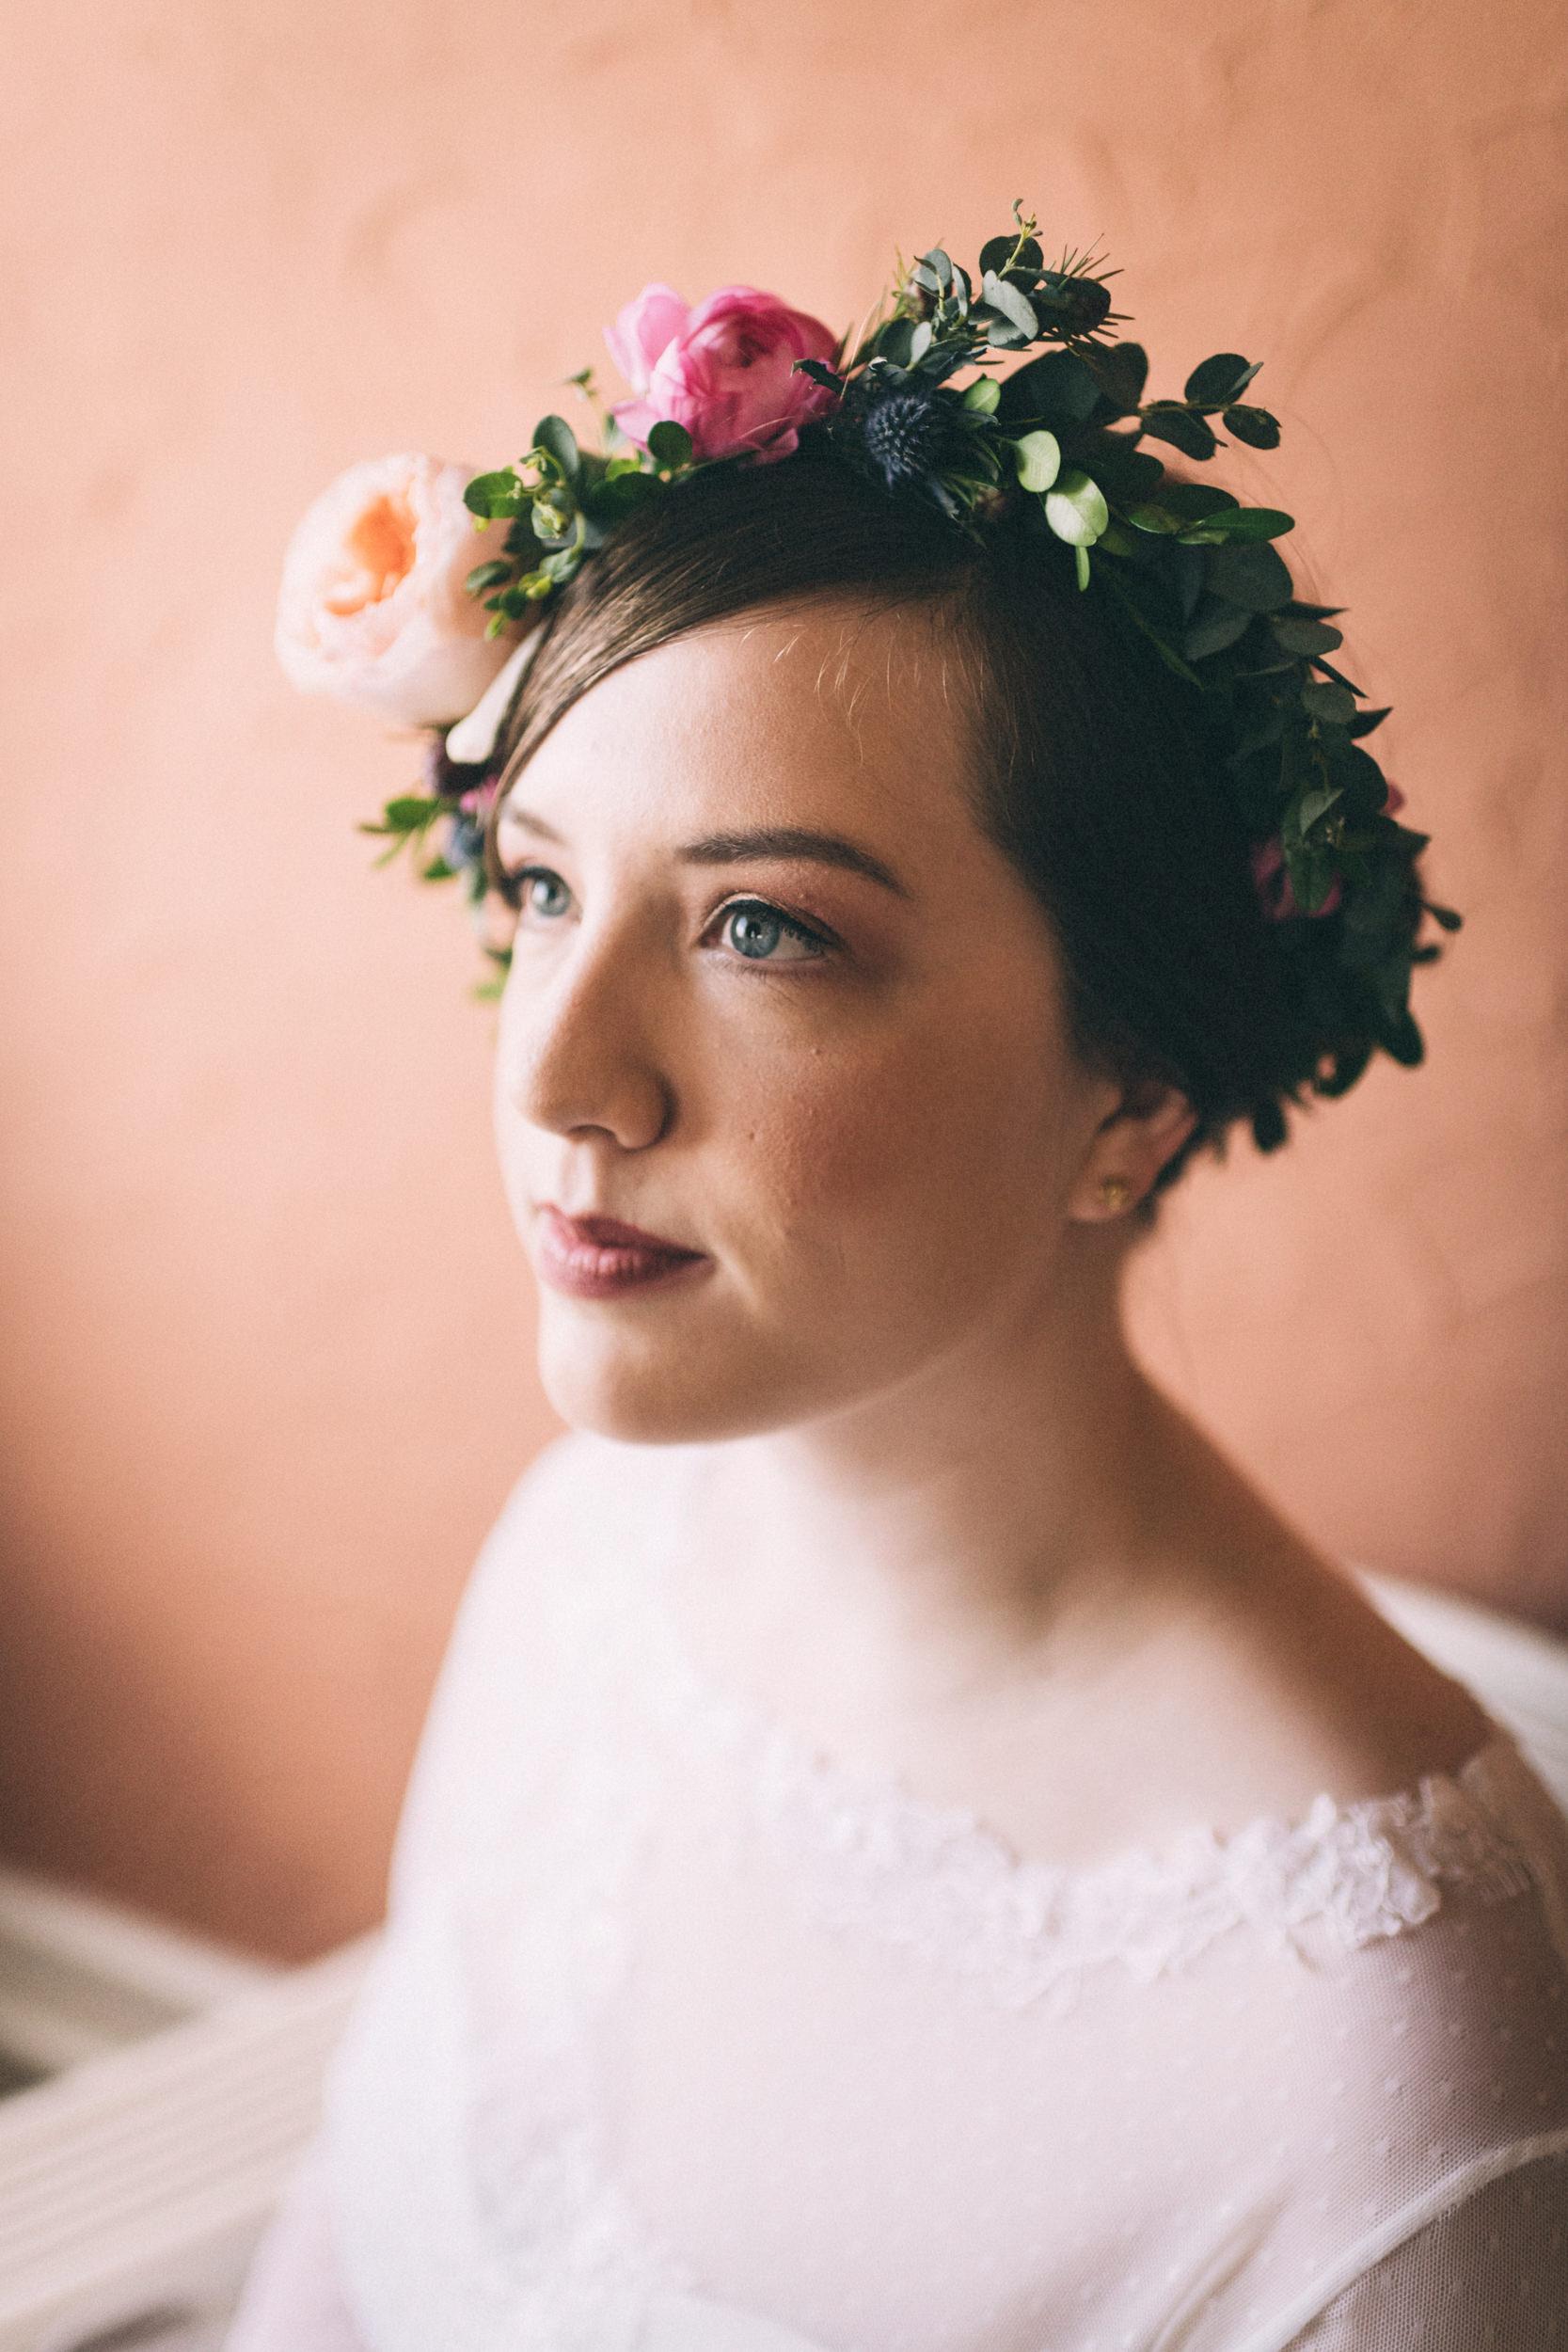 lauren-dean-wedding-grand-lodge-kentucky-sarah-katherine-davis-photography-120edit.jpg